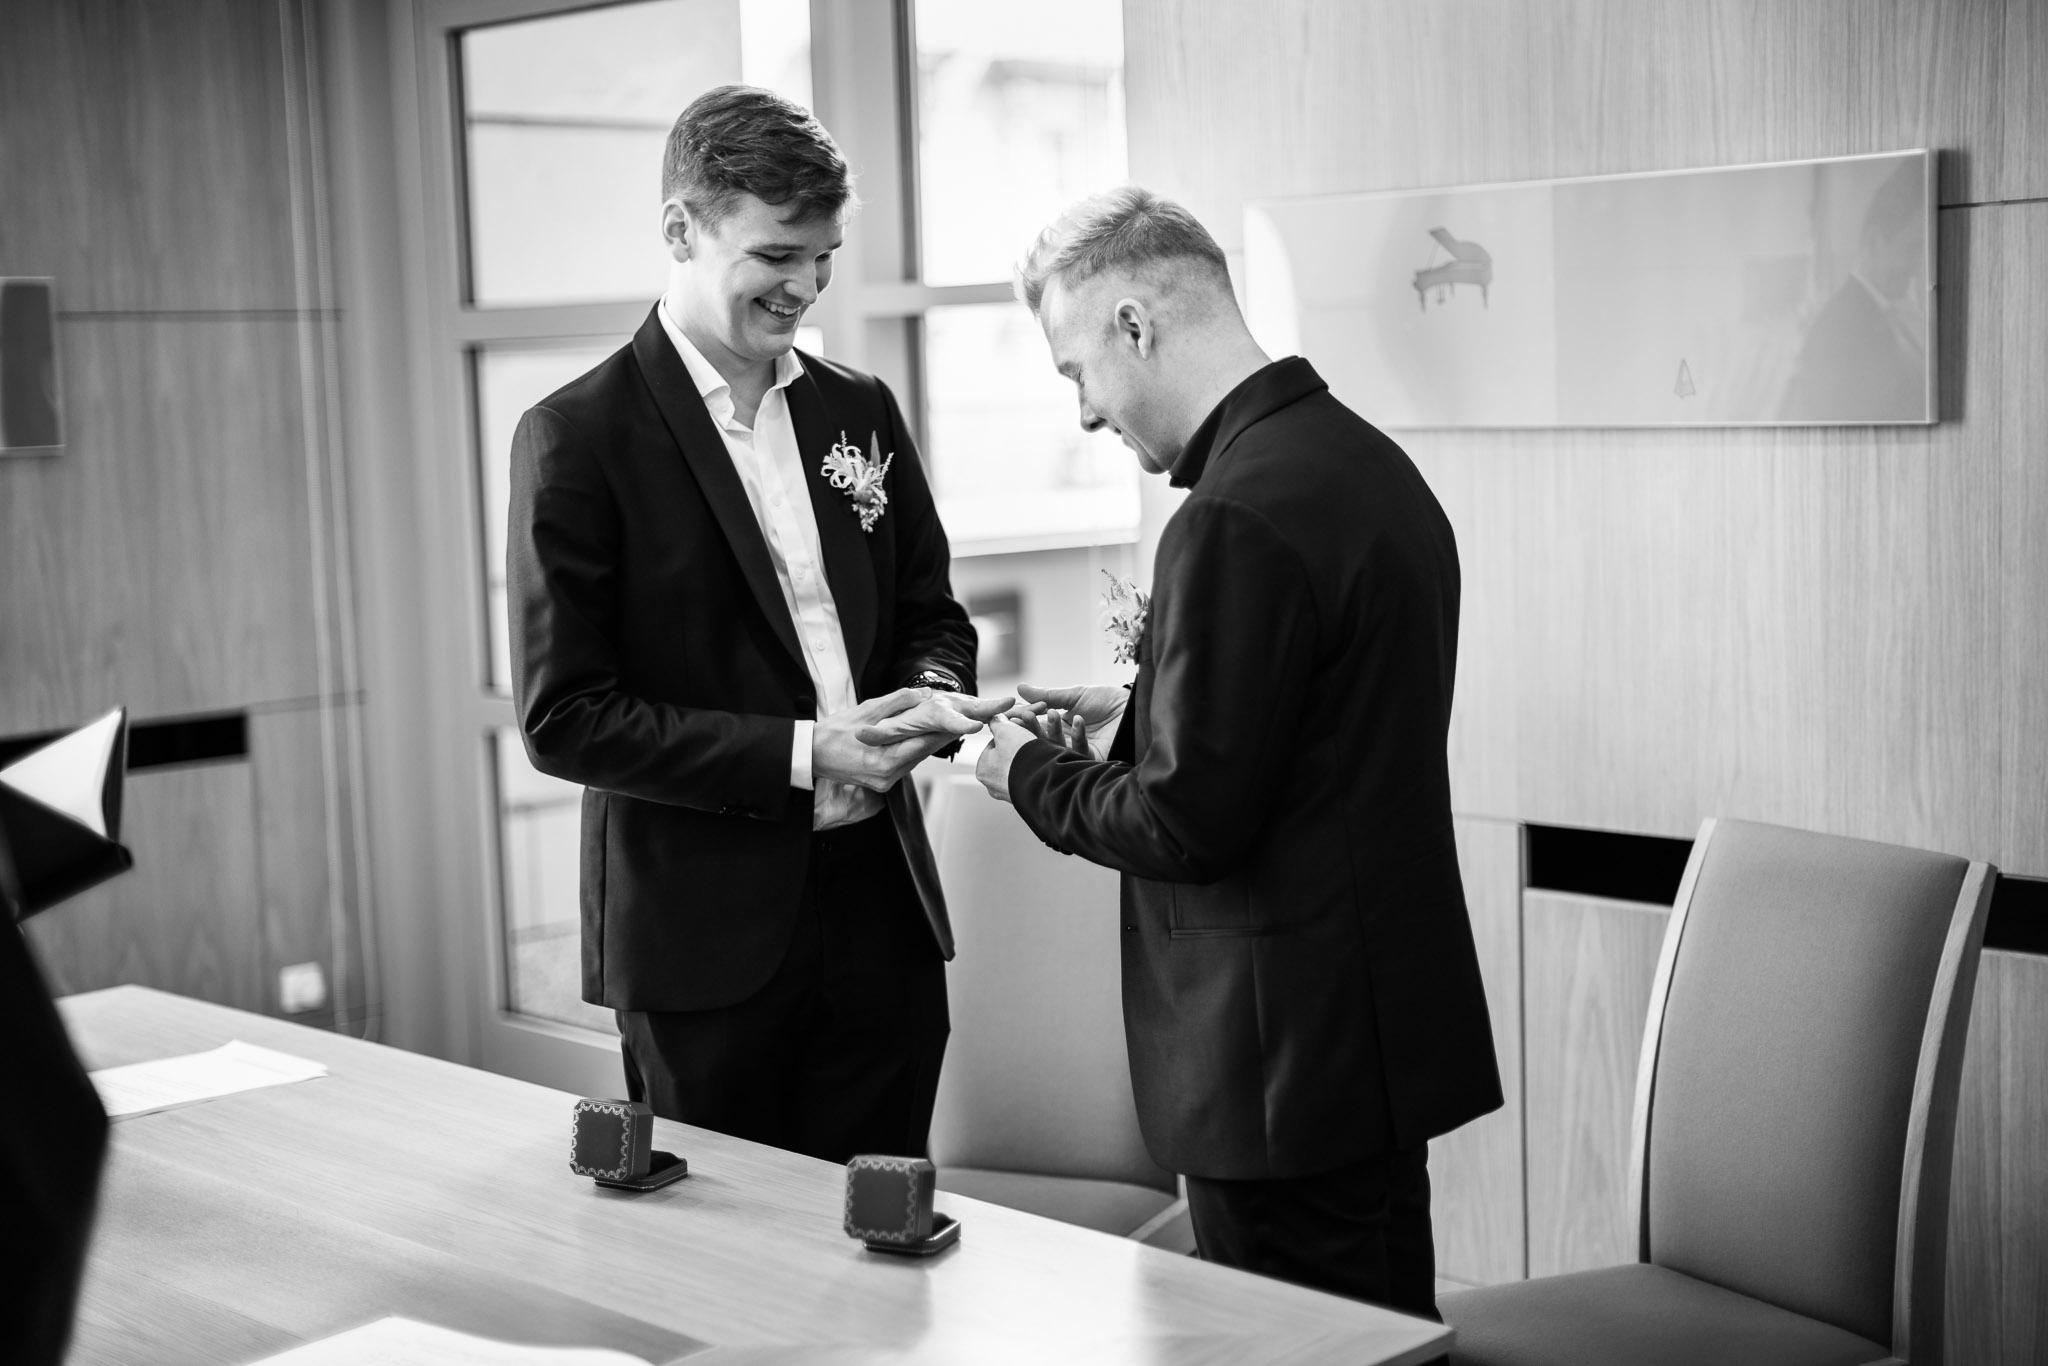 20_Hochzeit_Bräutigam.jpg